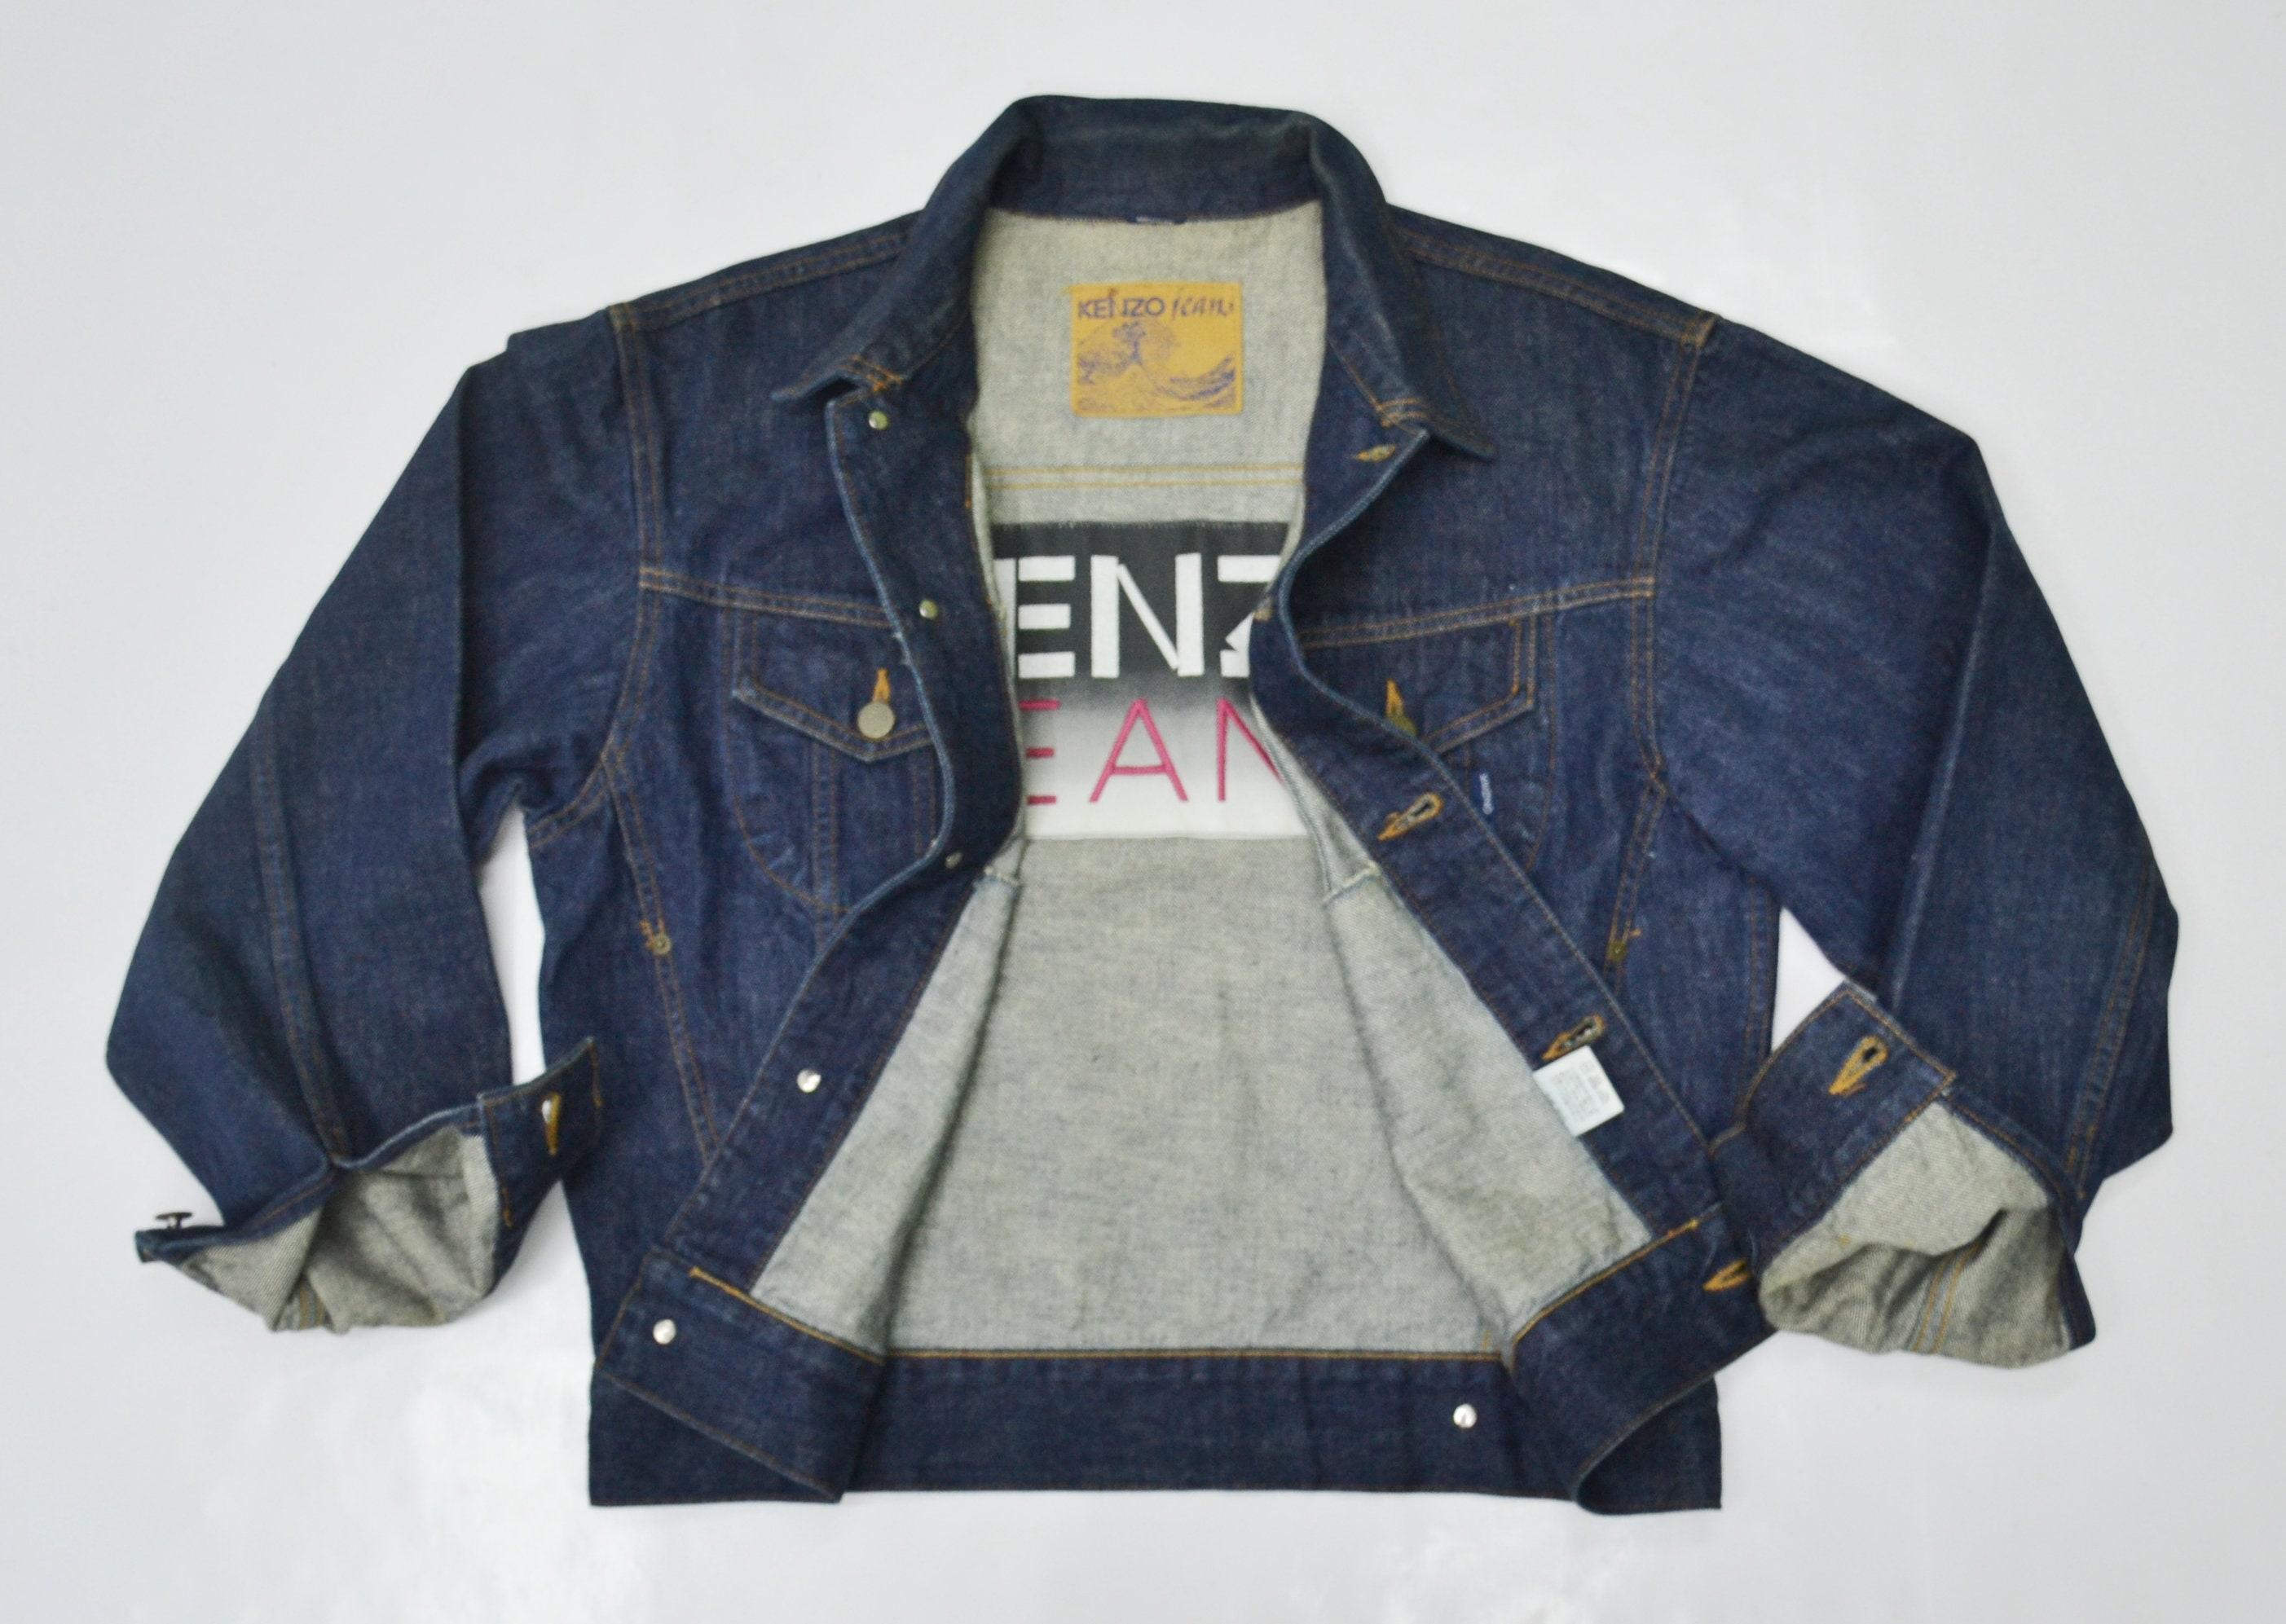 c848a6d9749 Kenzo Jacket Kenzo Jeans Denim Jacket Size M Vintage Kenzo Big